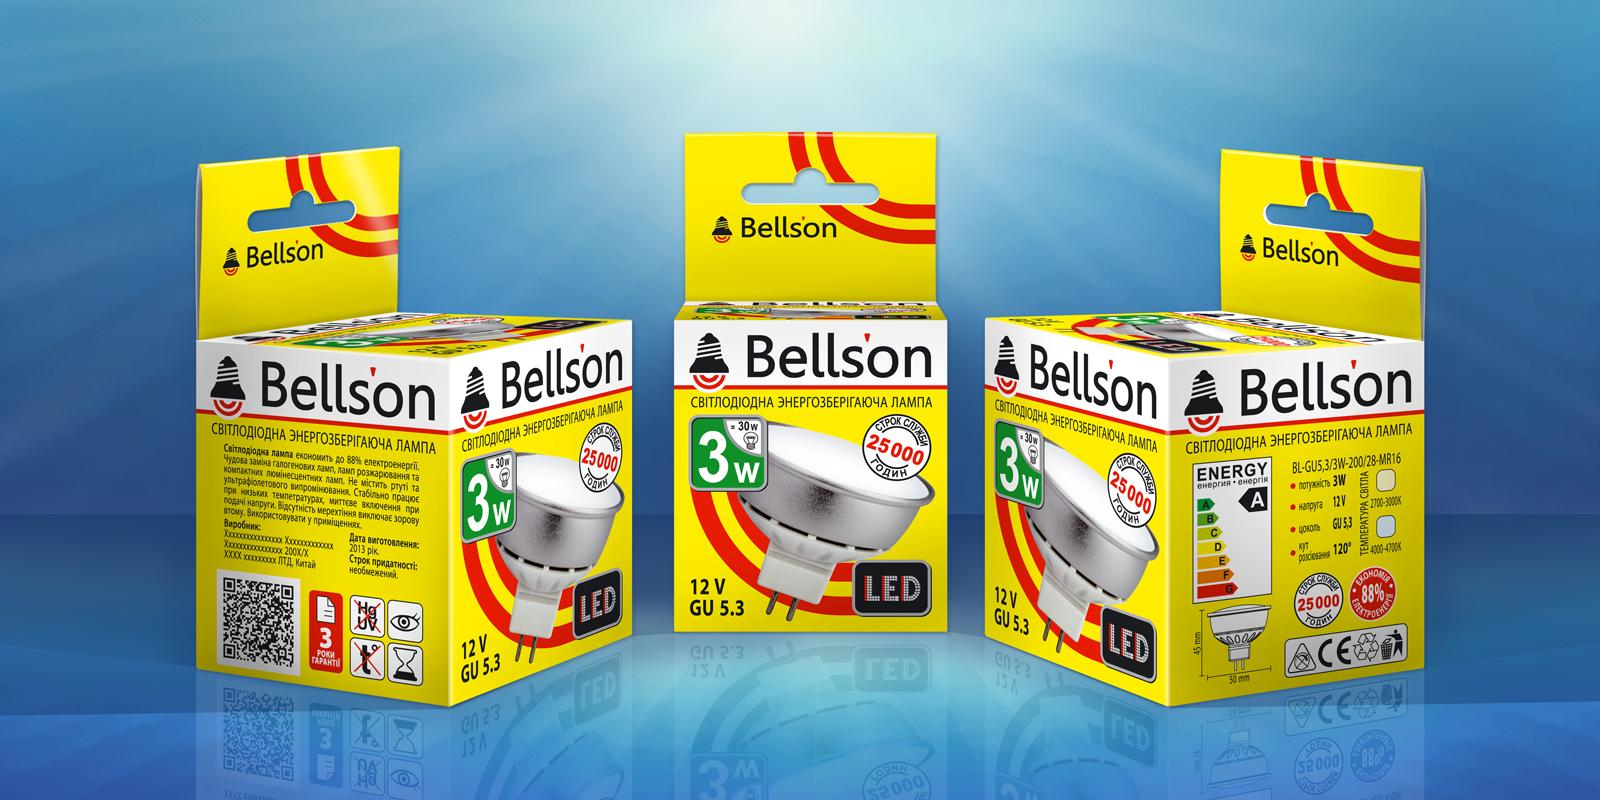 TM Bellson;;;;;;Разработка дизайна упаковки;;;;;;<span>Клиент:</span> TM Bellson;;;;;;;;;;;;Разработка дизайна упаковки;;;;;; 2 ;;;;;;